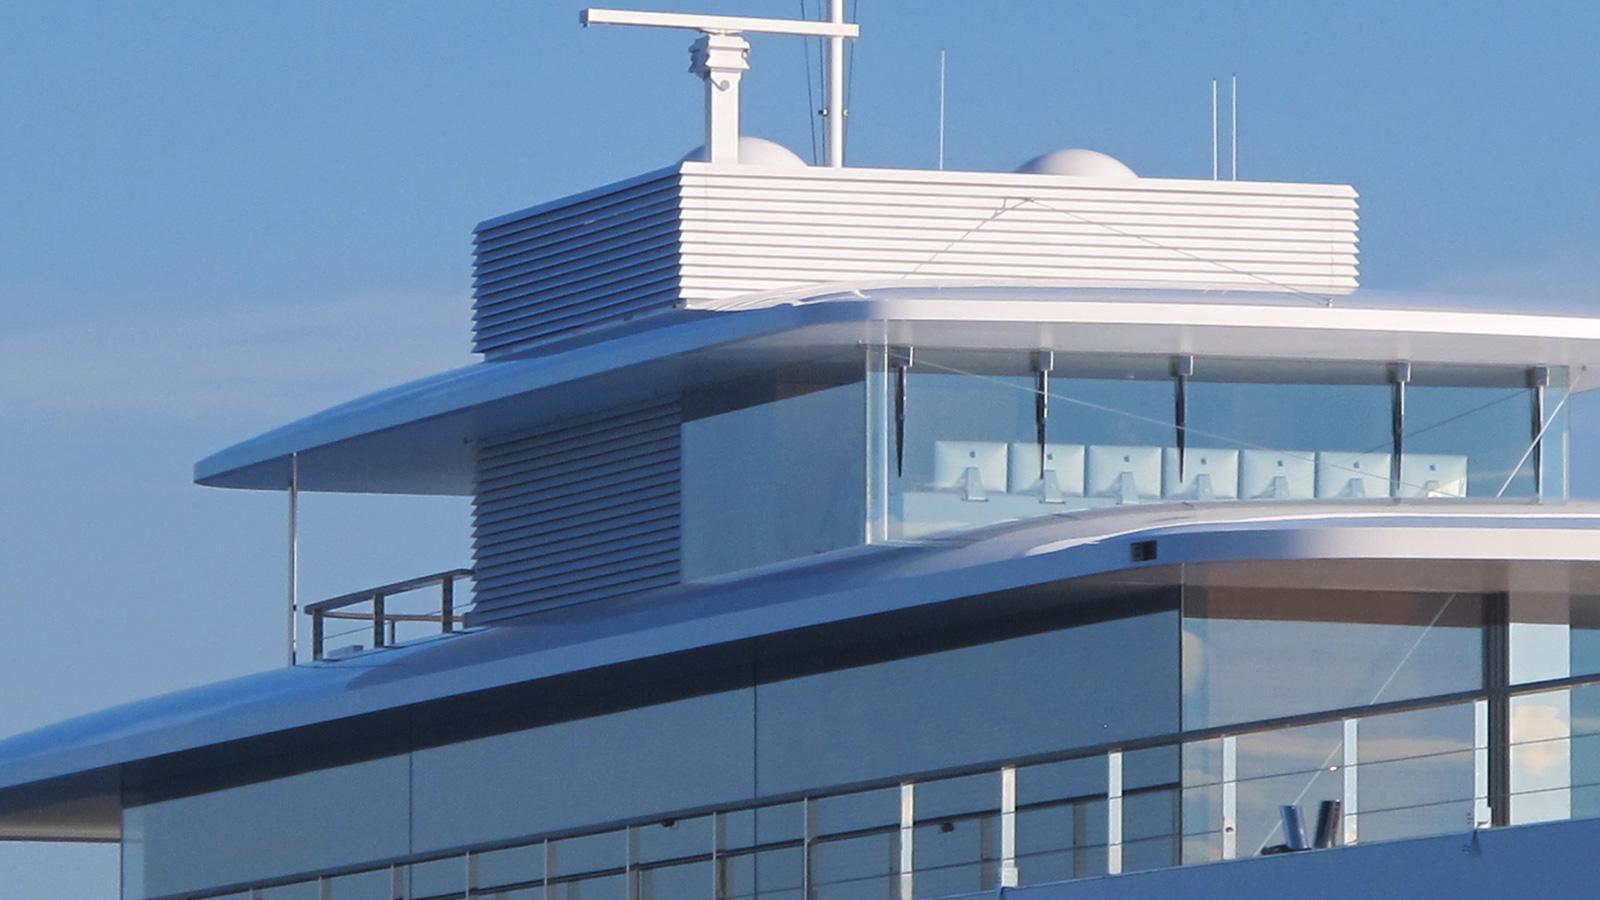 Steve Jobs superyacht Venus iMac bridge